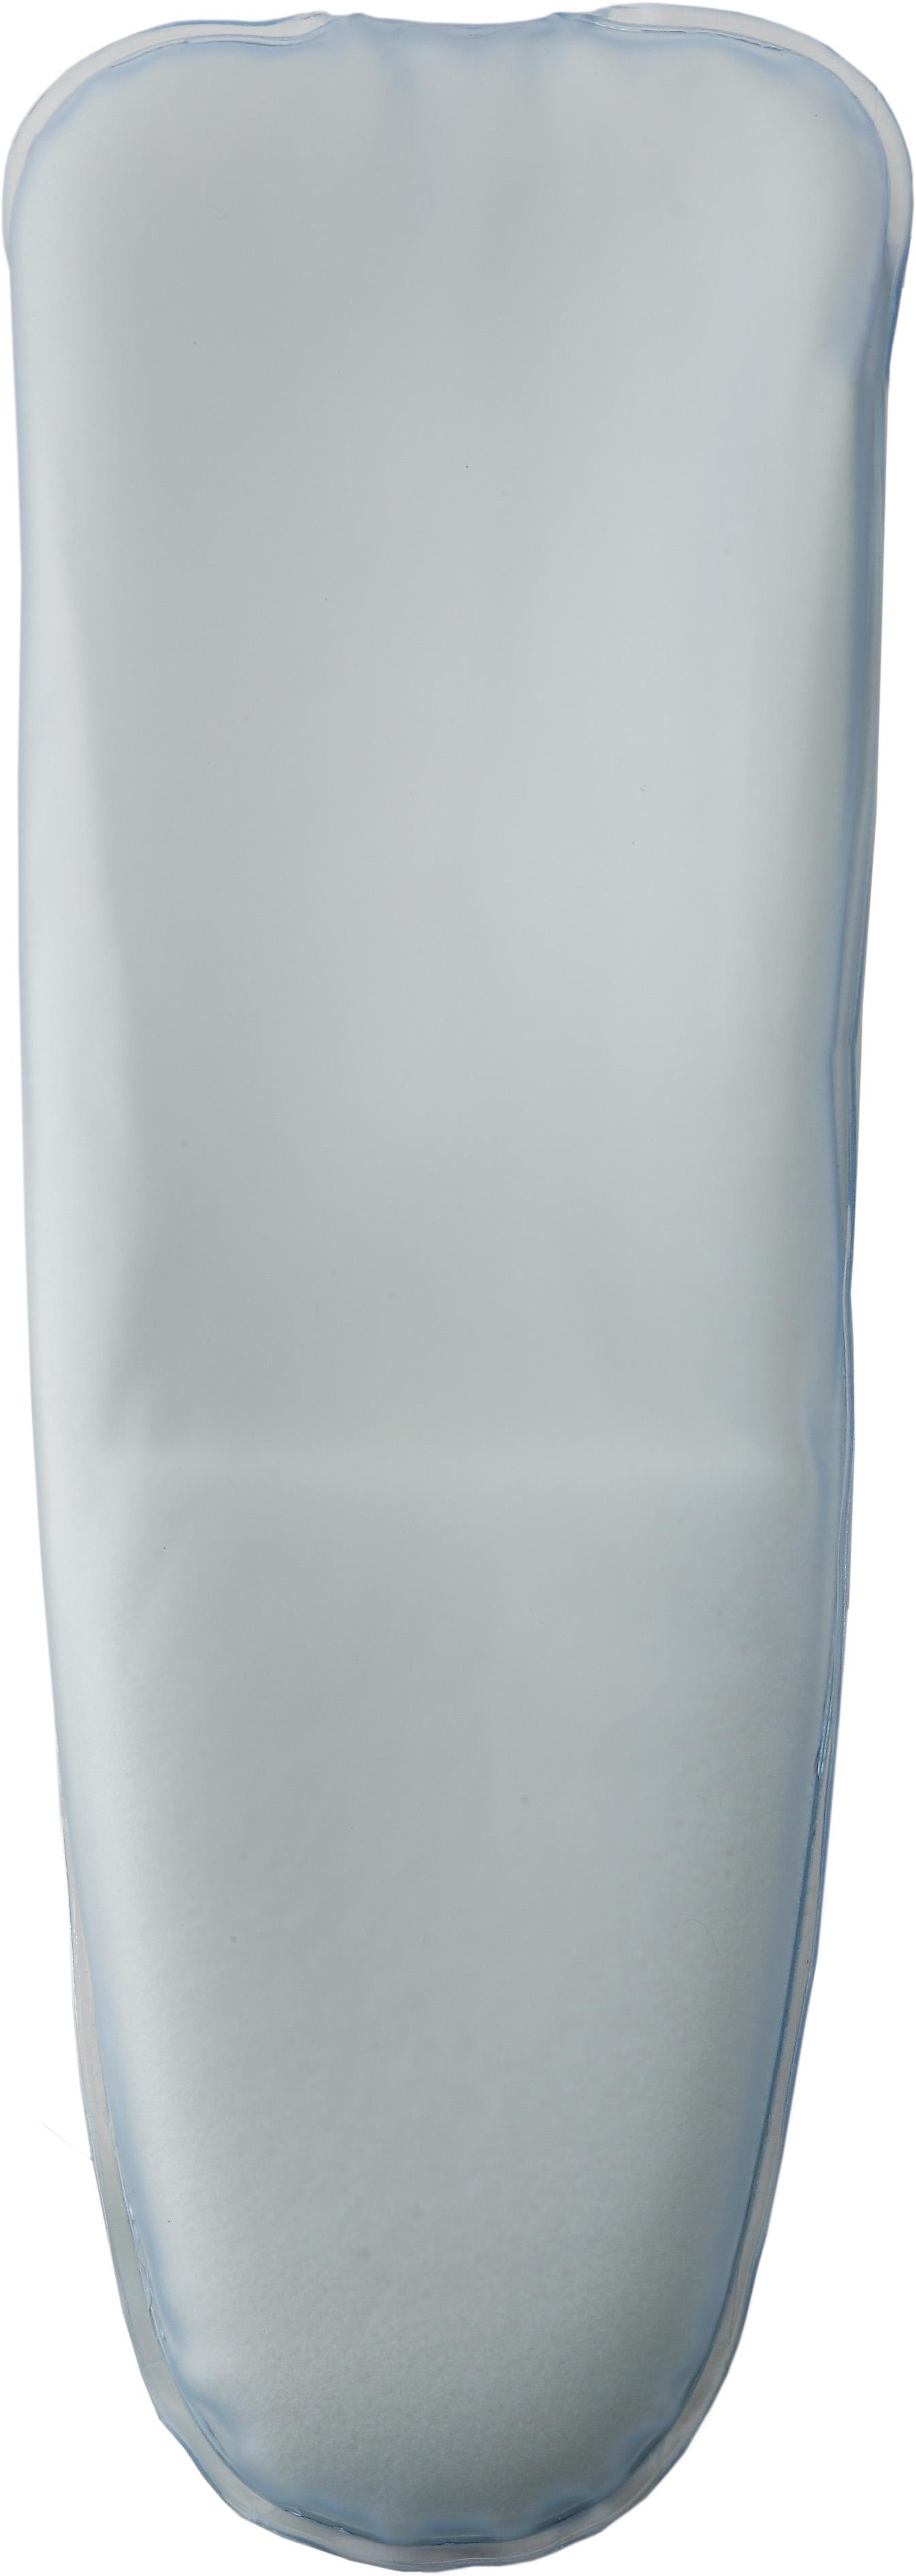 airform-inflated-stirrup-ankle-brace-adult-left-80200-ossur-os378483-3.jpg